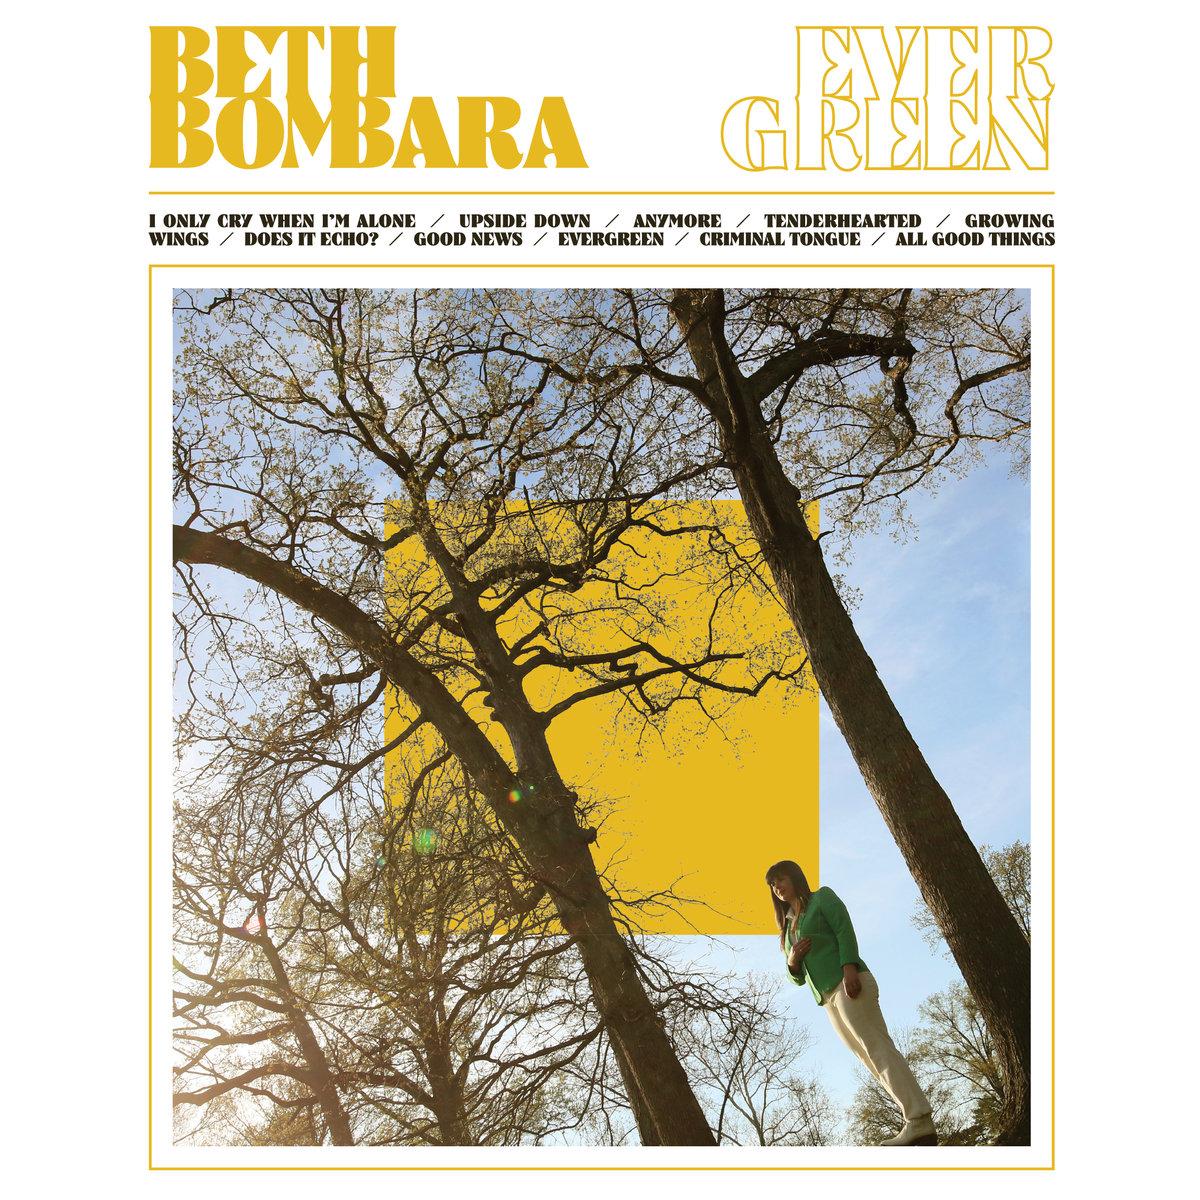 Beth Bombara – Evergreen (cover art)